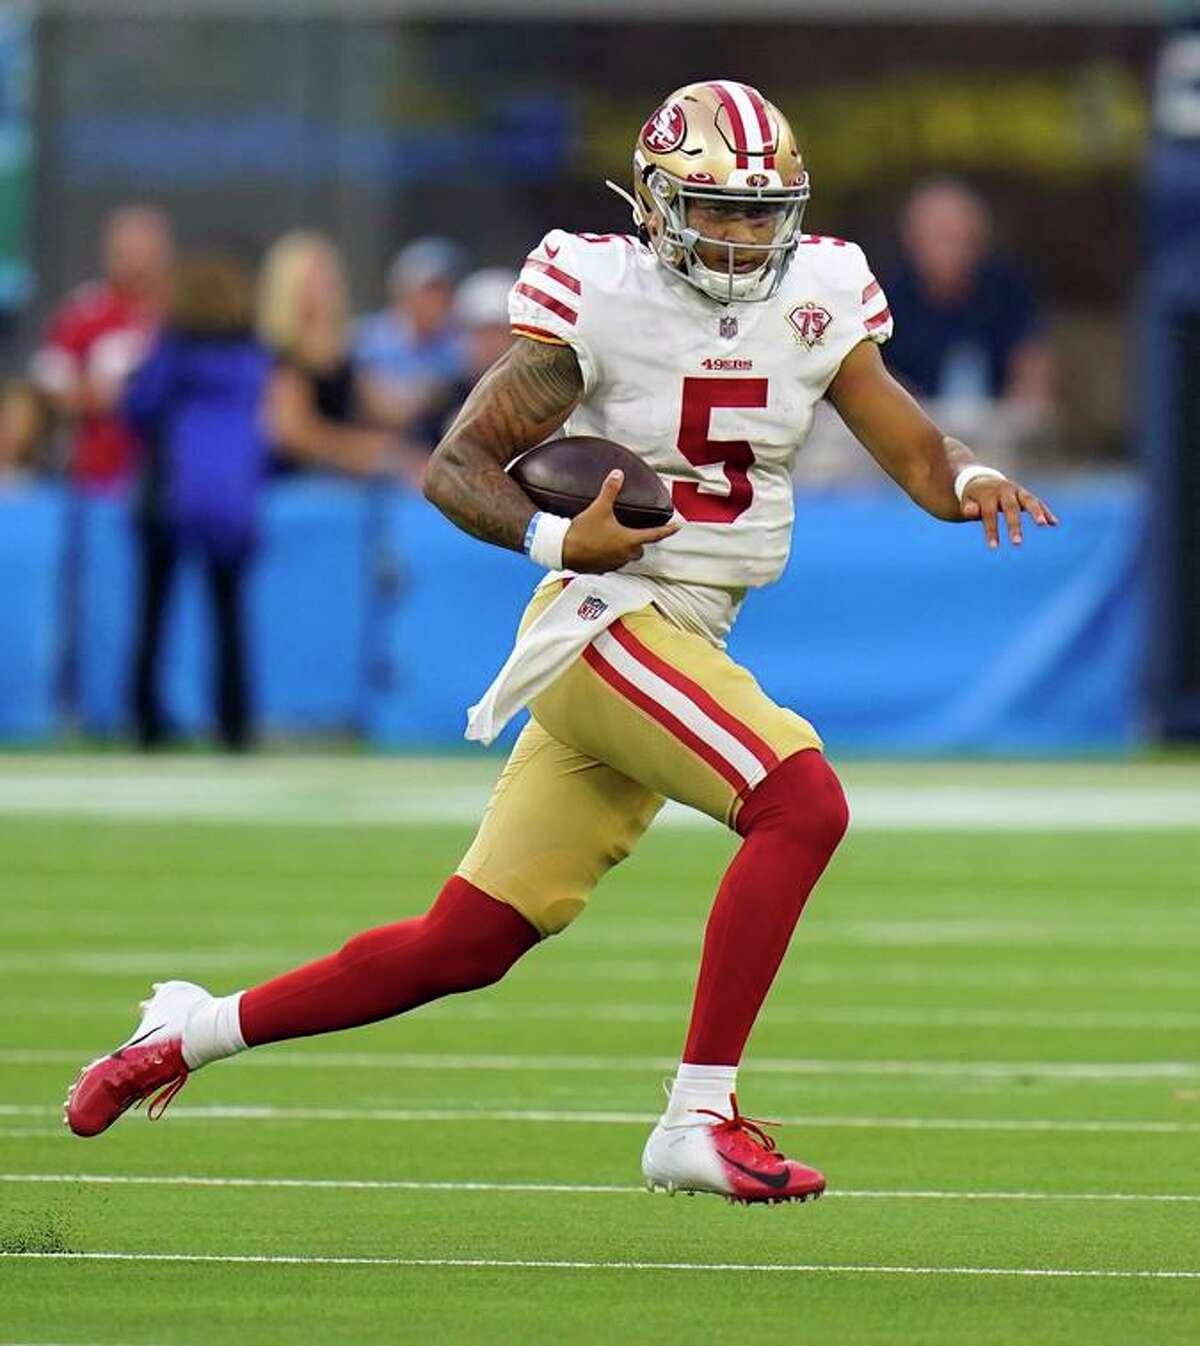 Speedy 49ers backup quarterback Trey Lance has just one run in 63 preseason snaps.